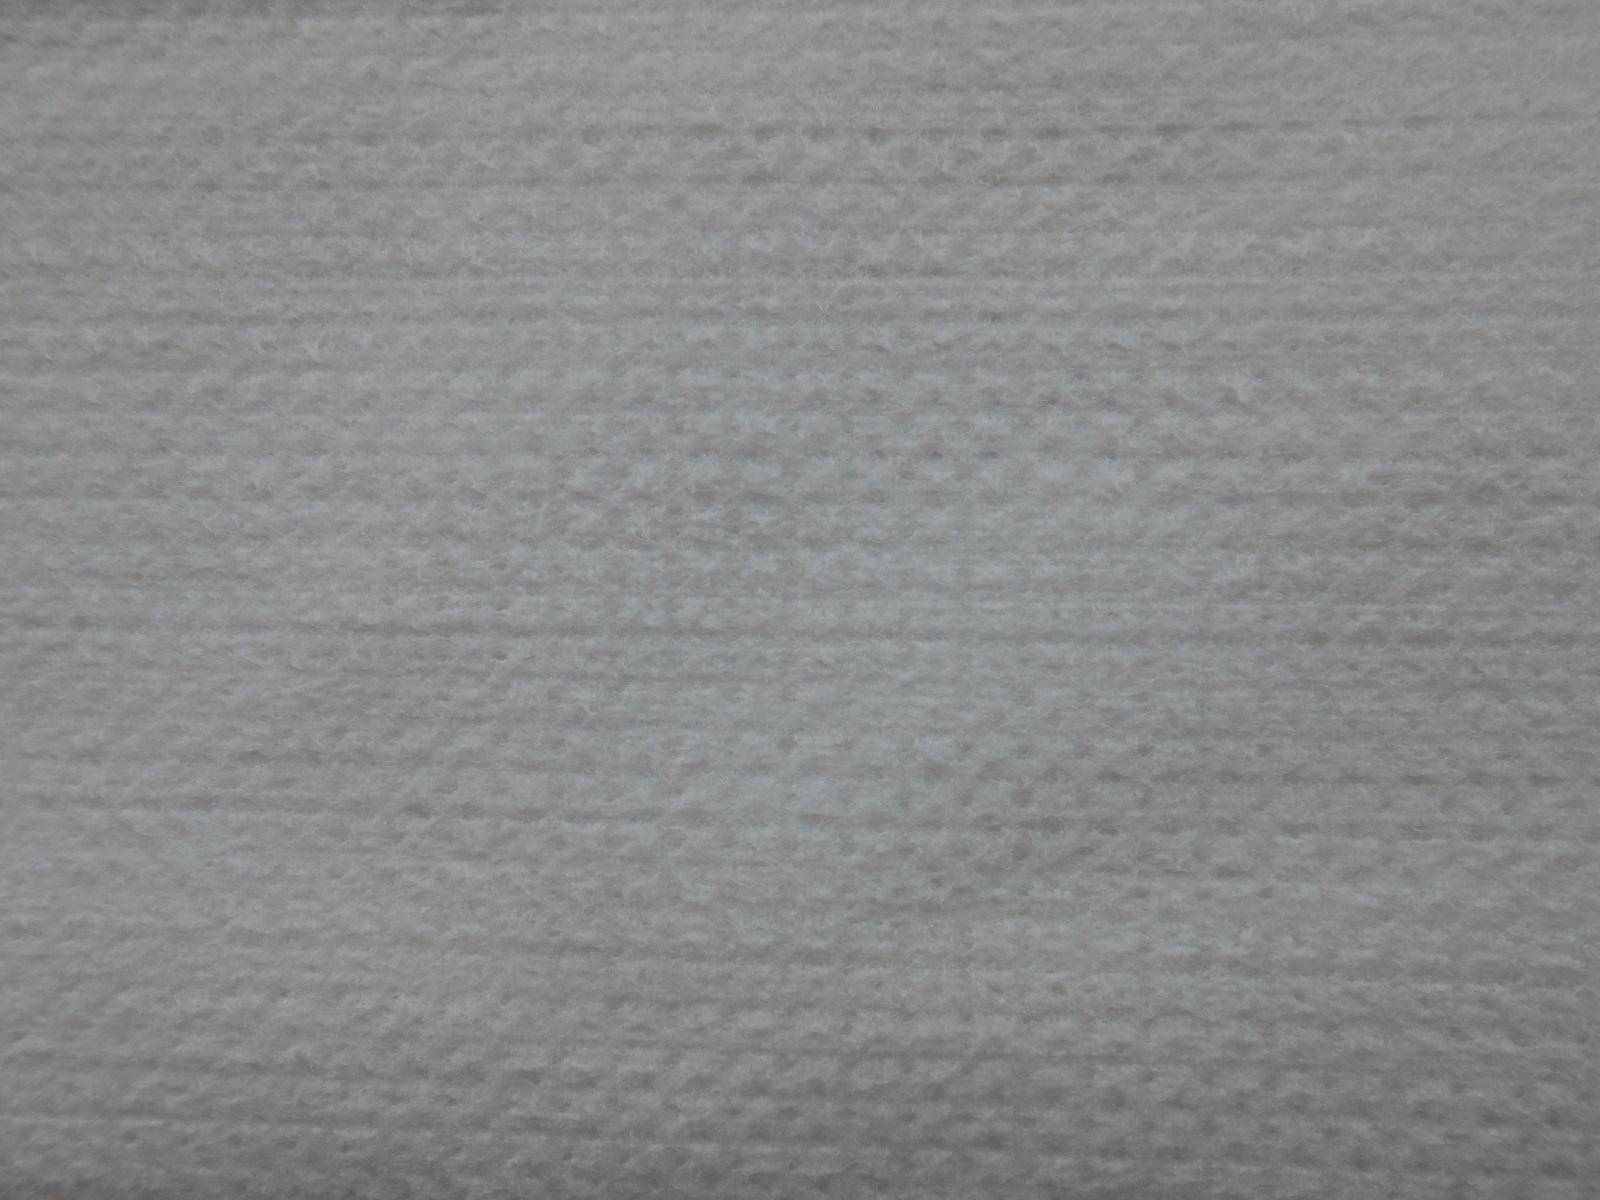 SOFTEXTRA White Z-fold 38x30cm- 10x44sh